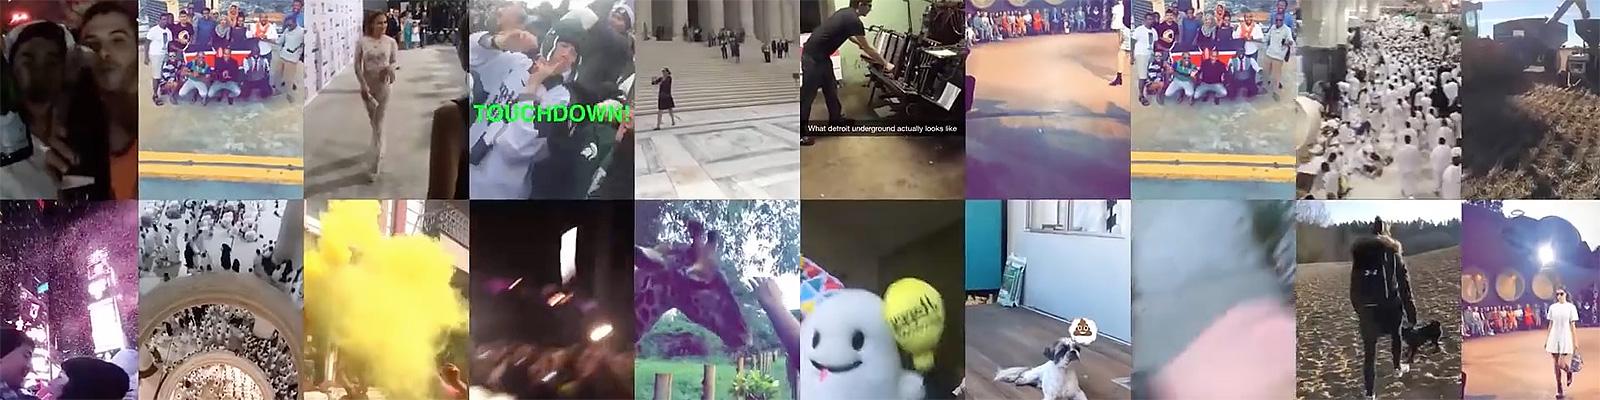 Intro to Snapchat(Snapchat)